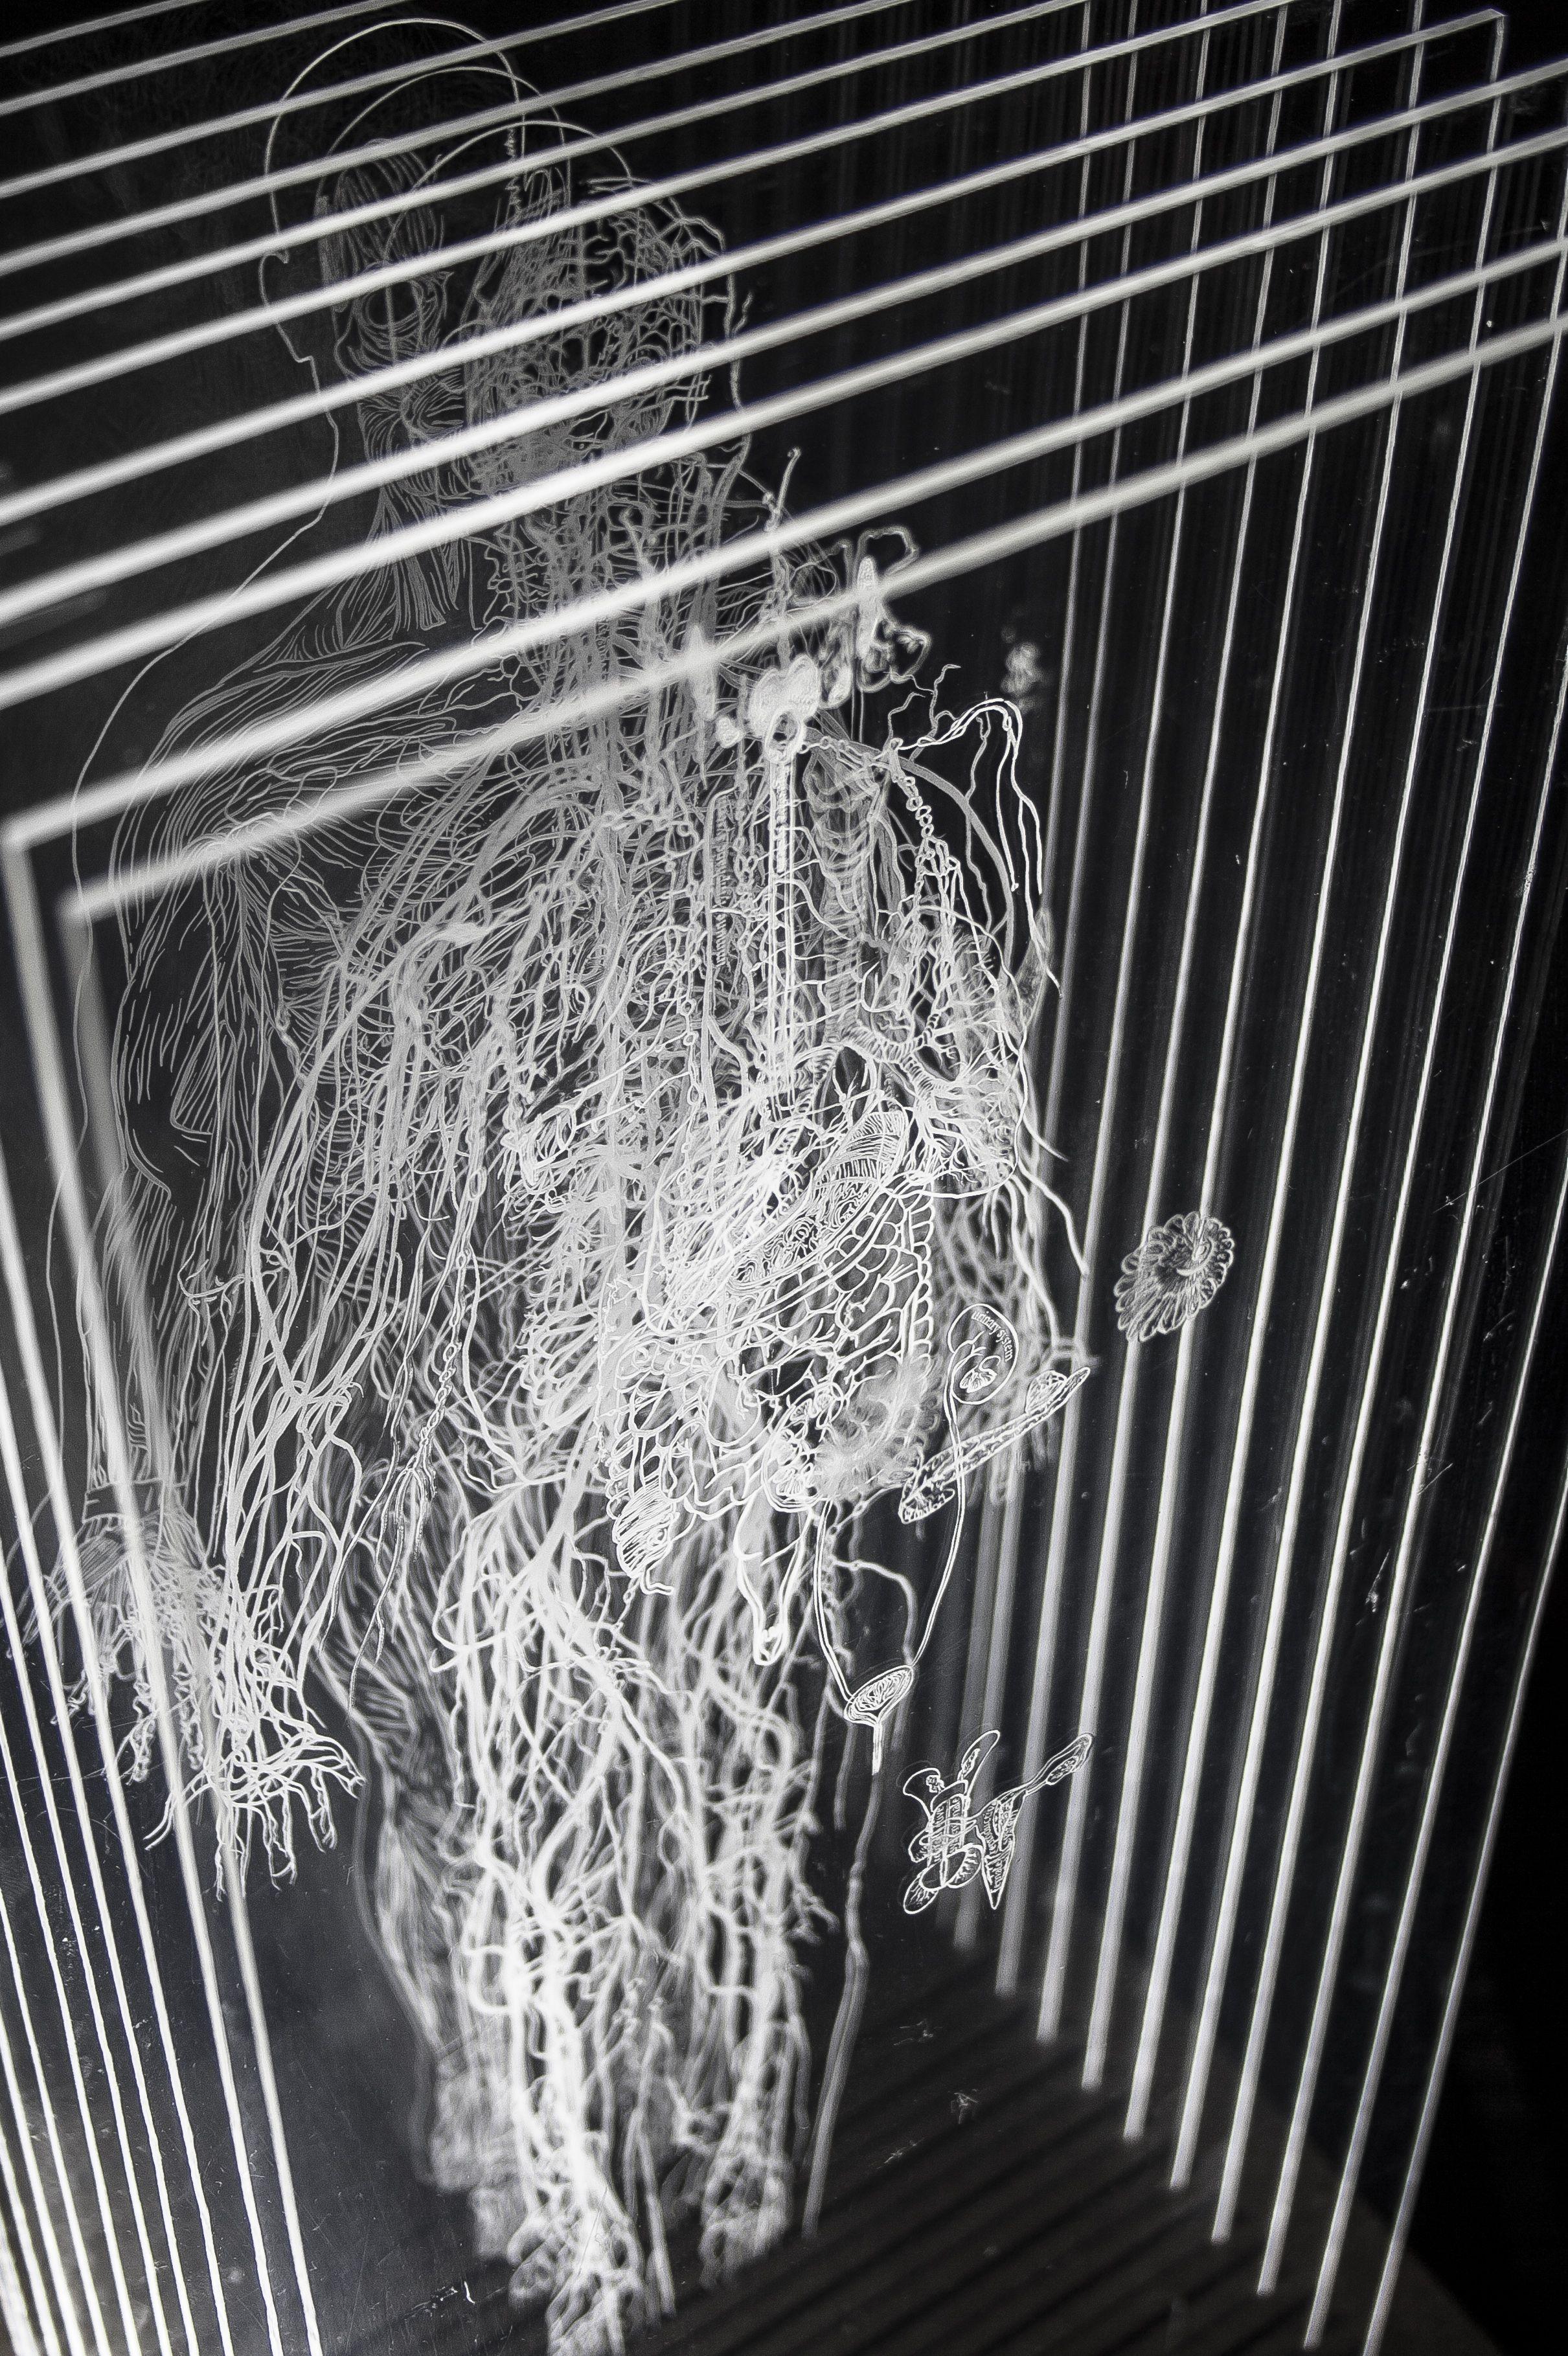 A set of 11 laser engraved movable plexiglasses illustrating the human body systems linear illustrations designed in adobe illustrator 45 cm x 19 cm